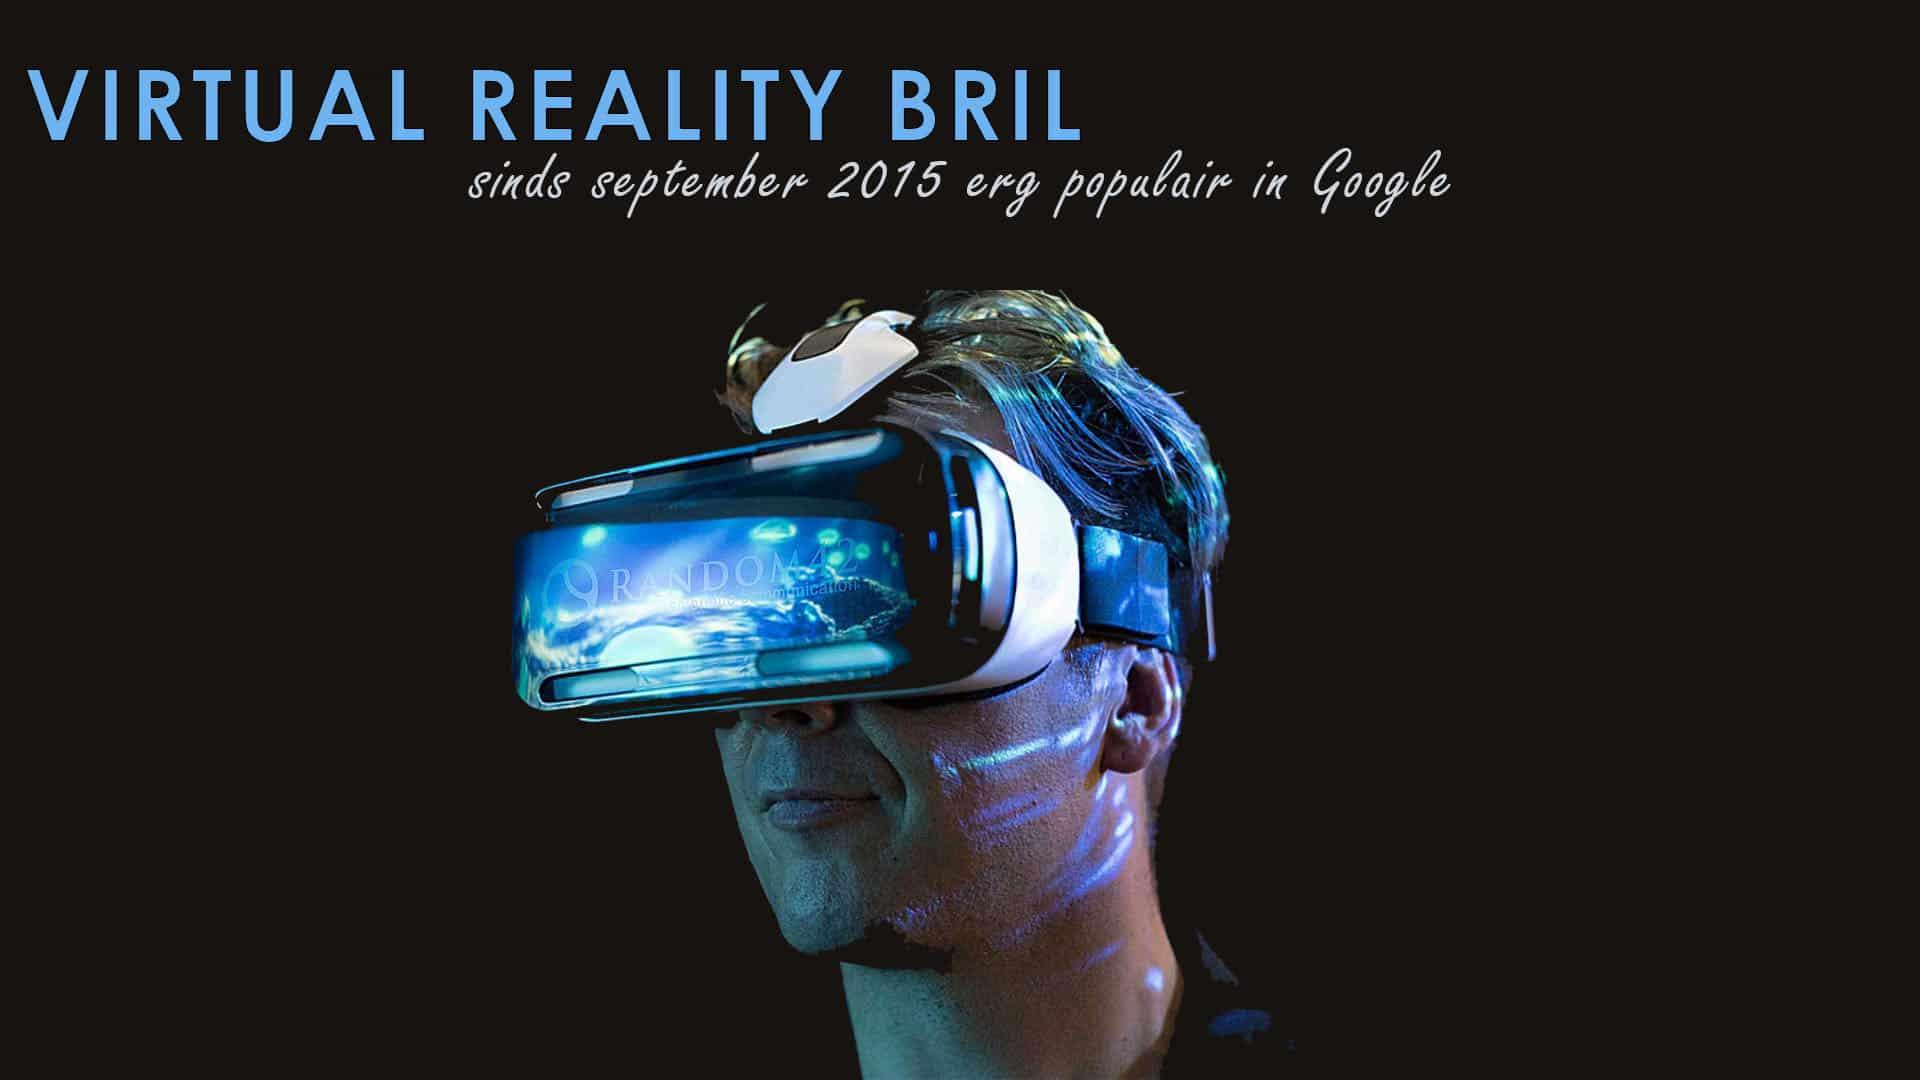 Virtual Reality bril populair Google